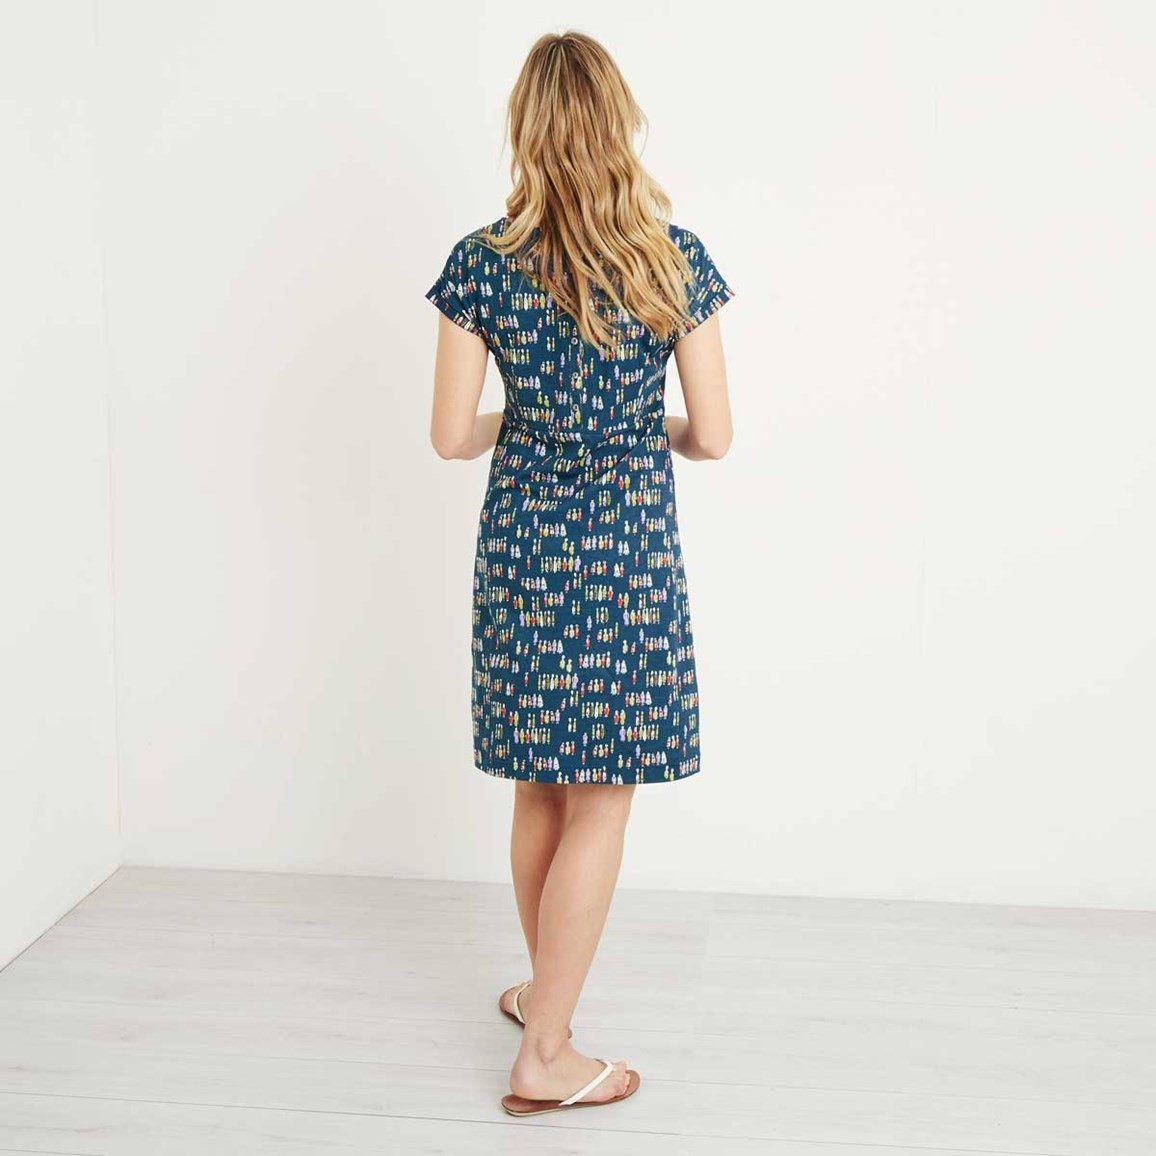 09f83638b85 Tallahassee Printed Cotton Jersey Dress Navy